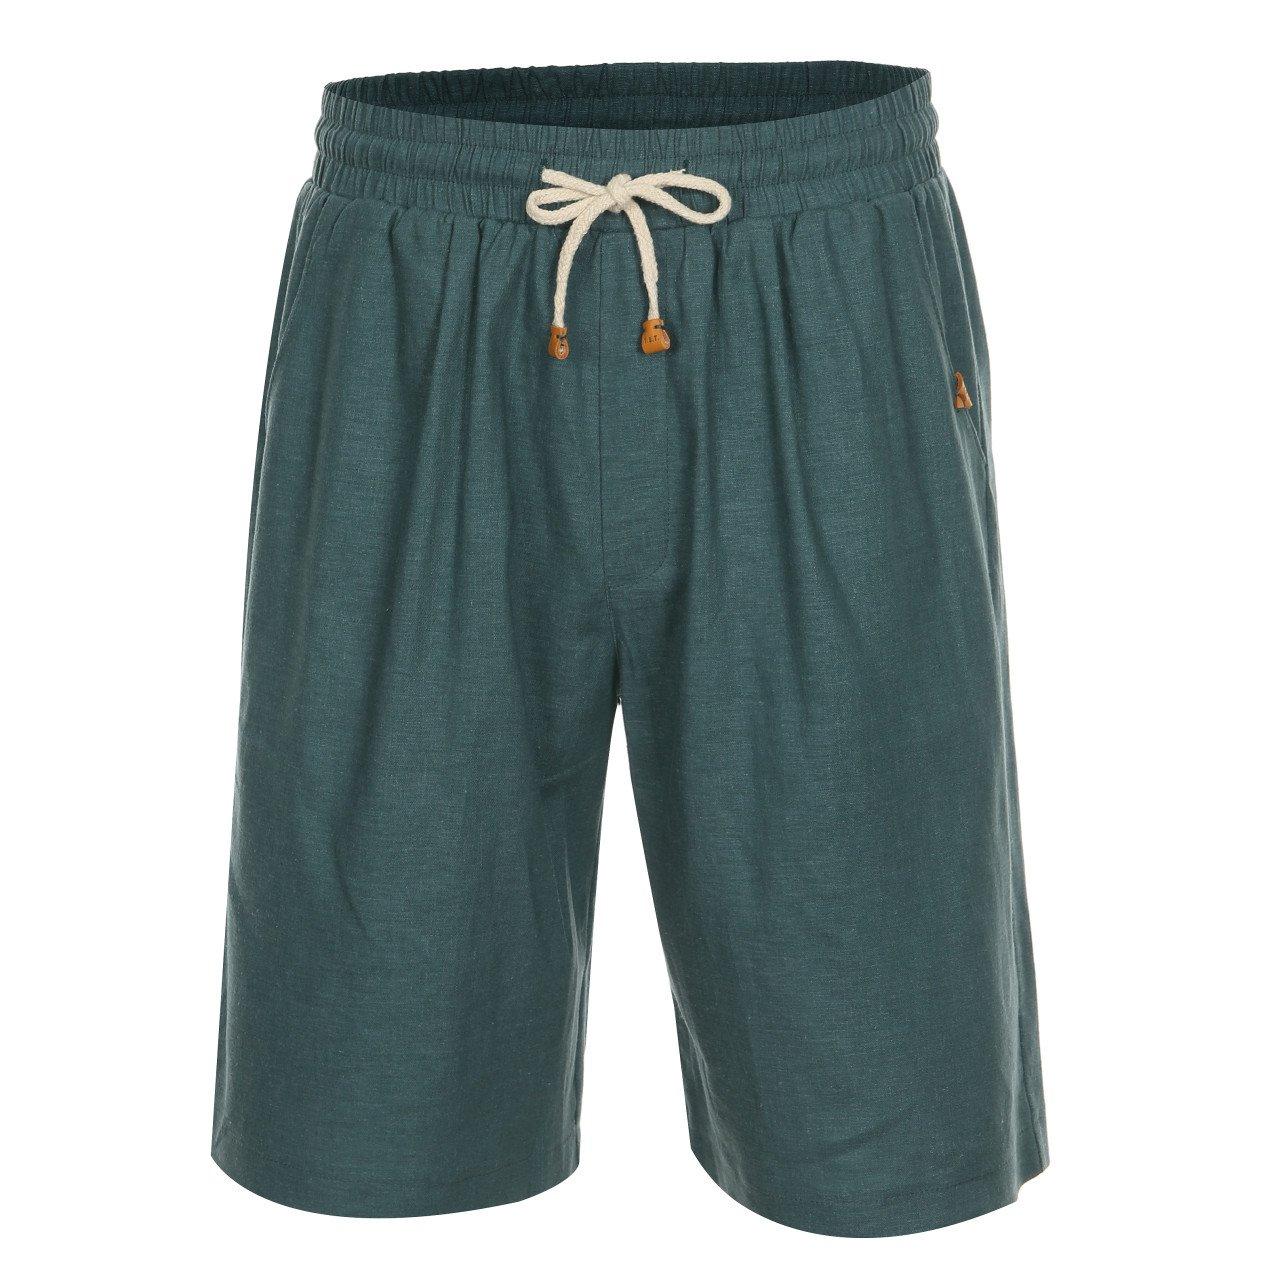 T.B.T. Men's Casual Basic Linen Shorts Elastic Waist Band Drawstring (A71S01-BLUEGREEN-L)